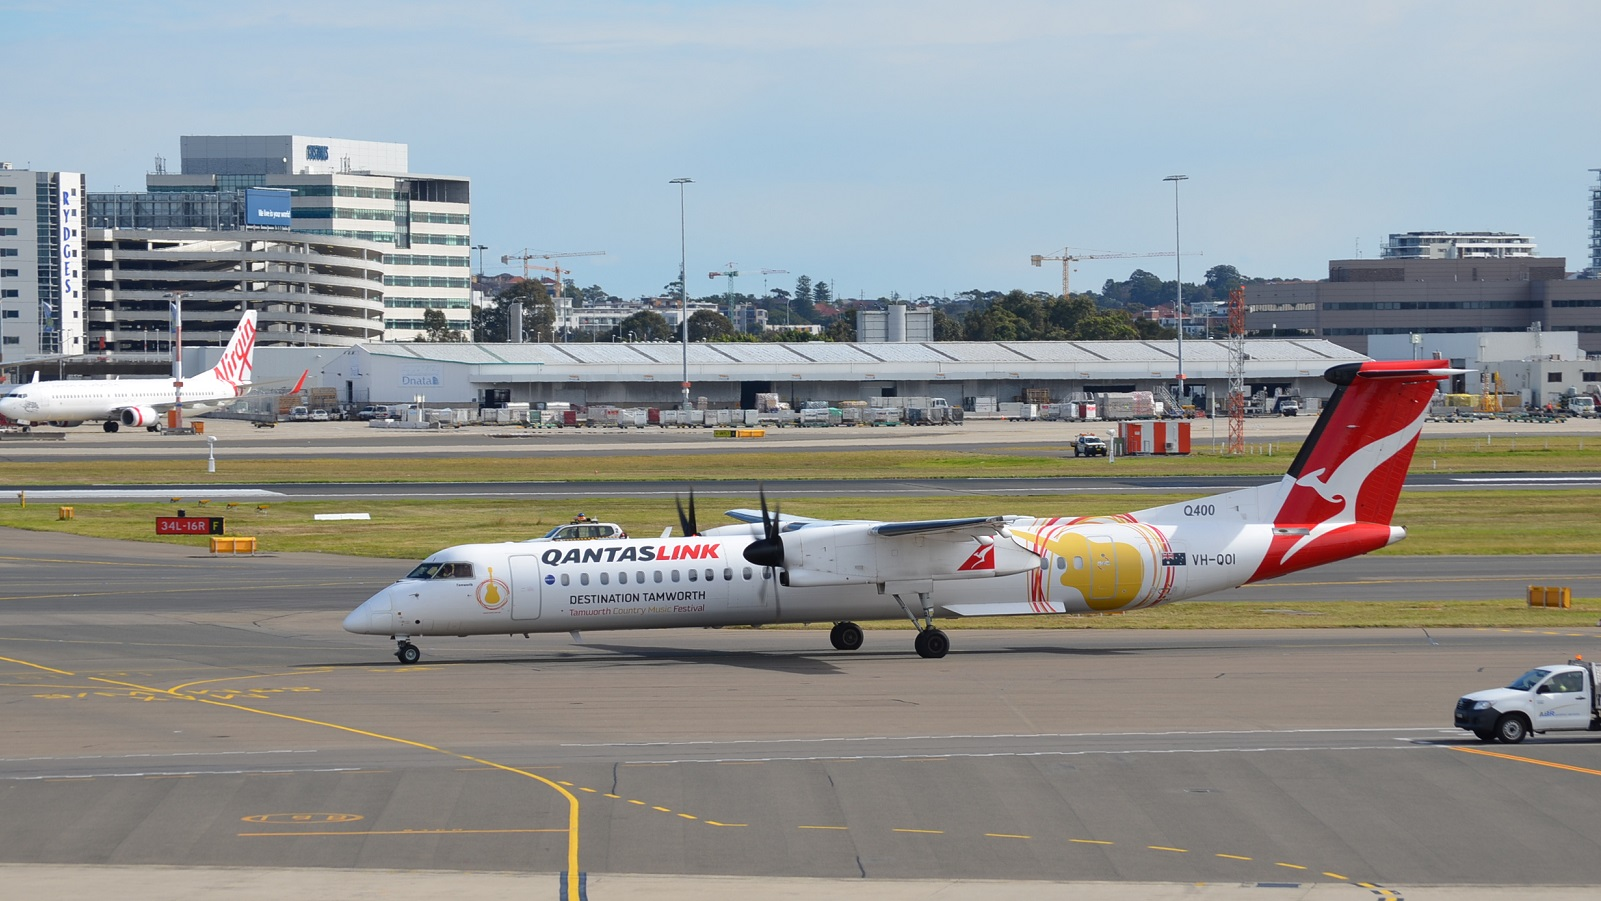 qantas background Buy qantas bags online at wwwbagworldcomau - best prices, biggest range  and free delivery australia wide.